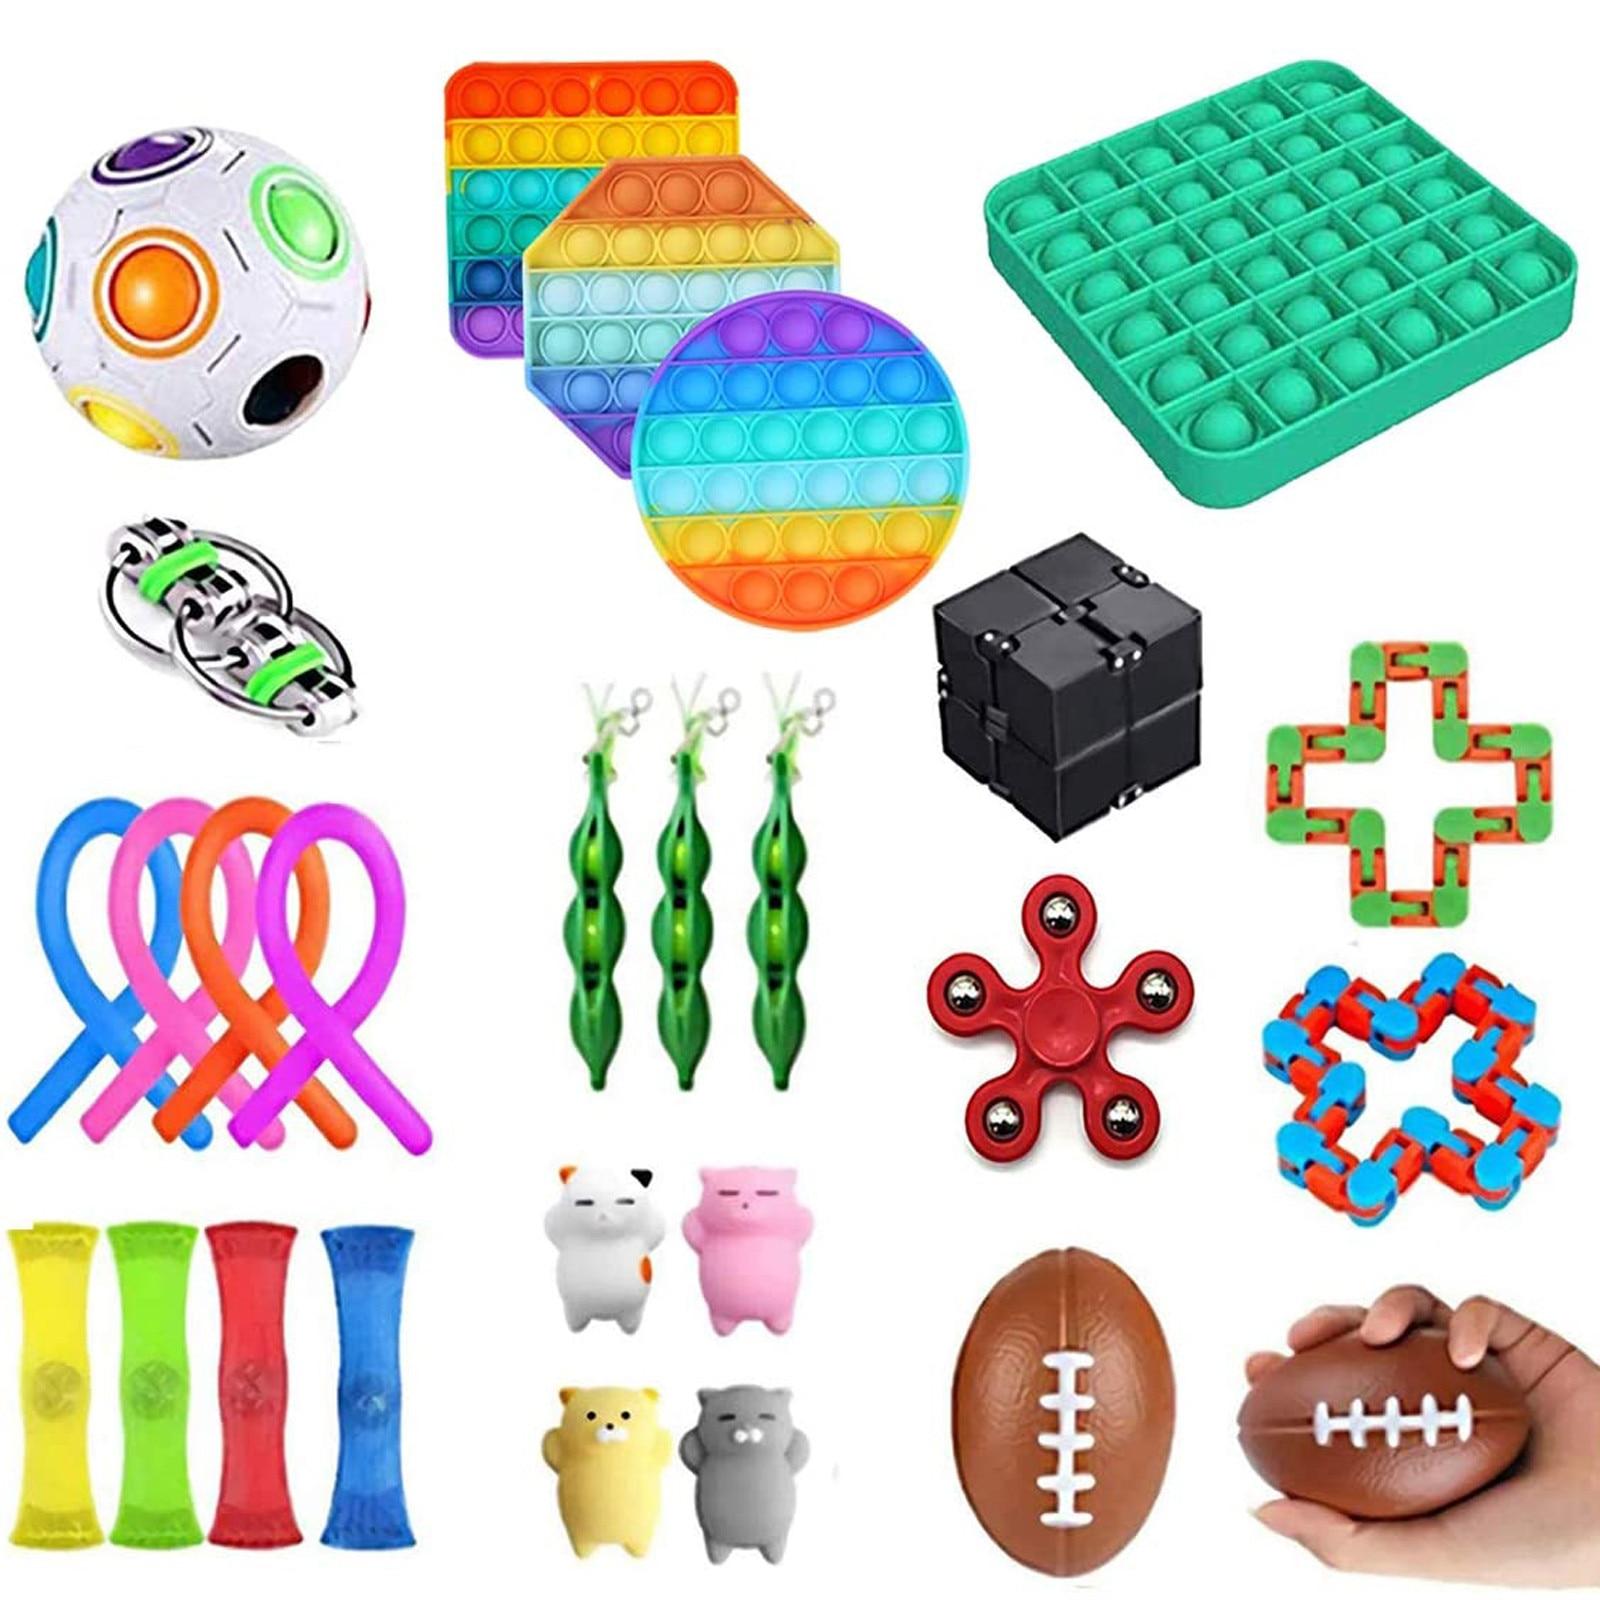 29/25Pcs Fidget Toy Set Cheap Sensory Fidget Toys Pack for Kids or Adults Decompression img5